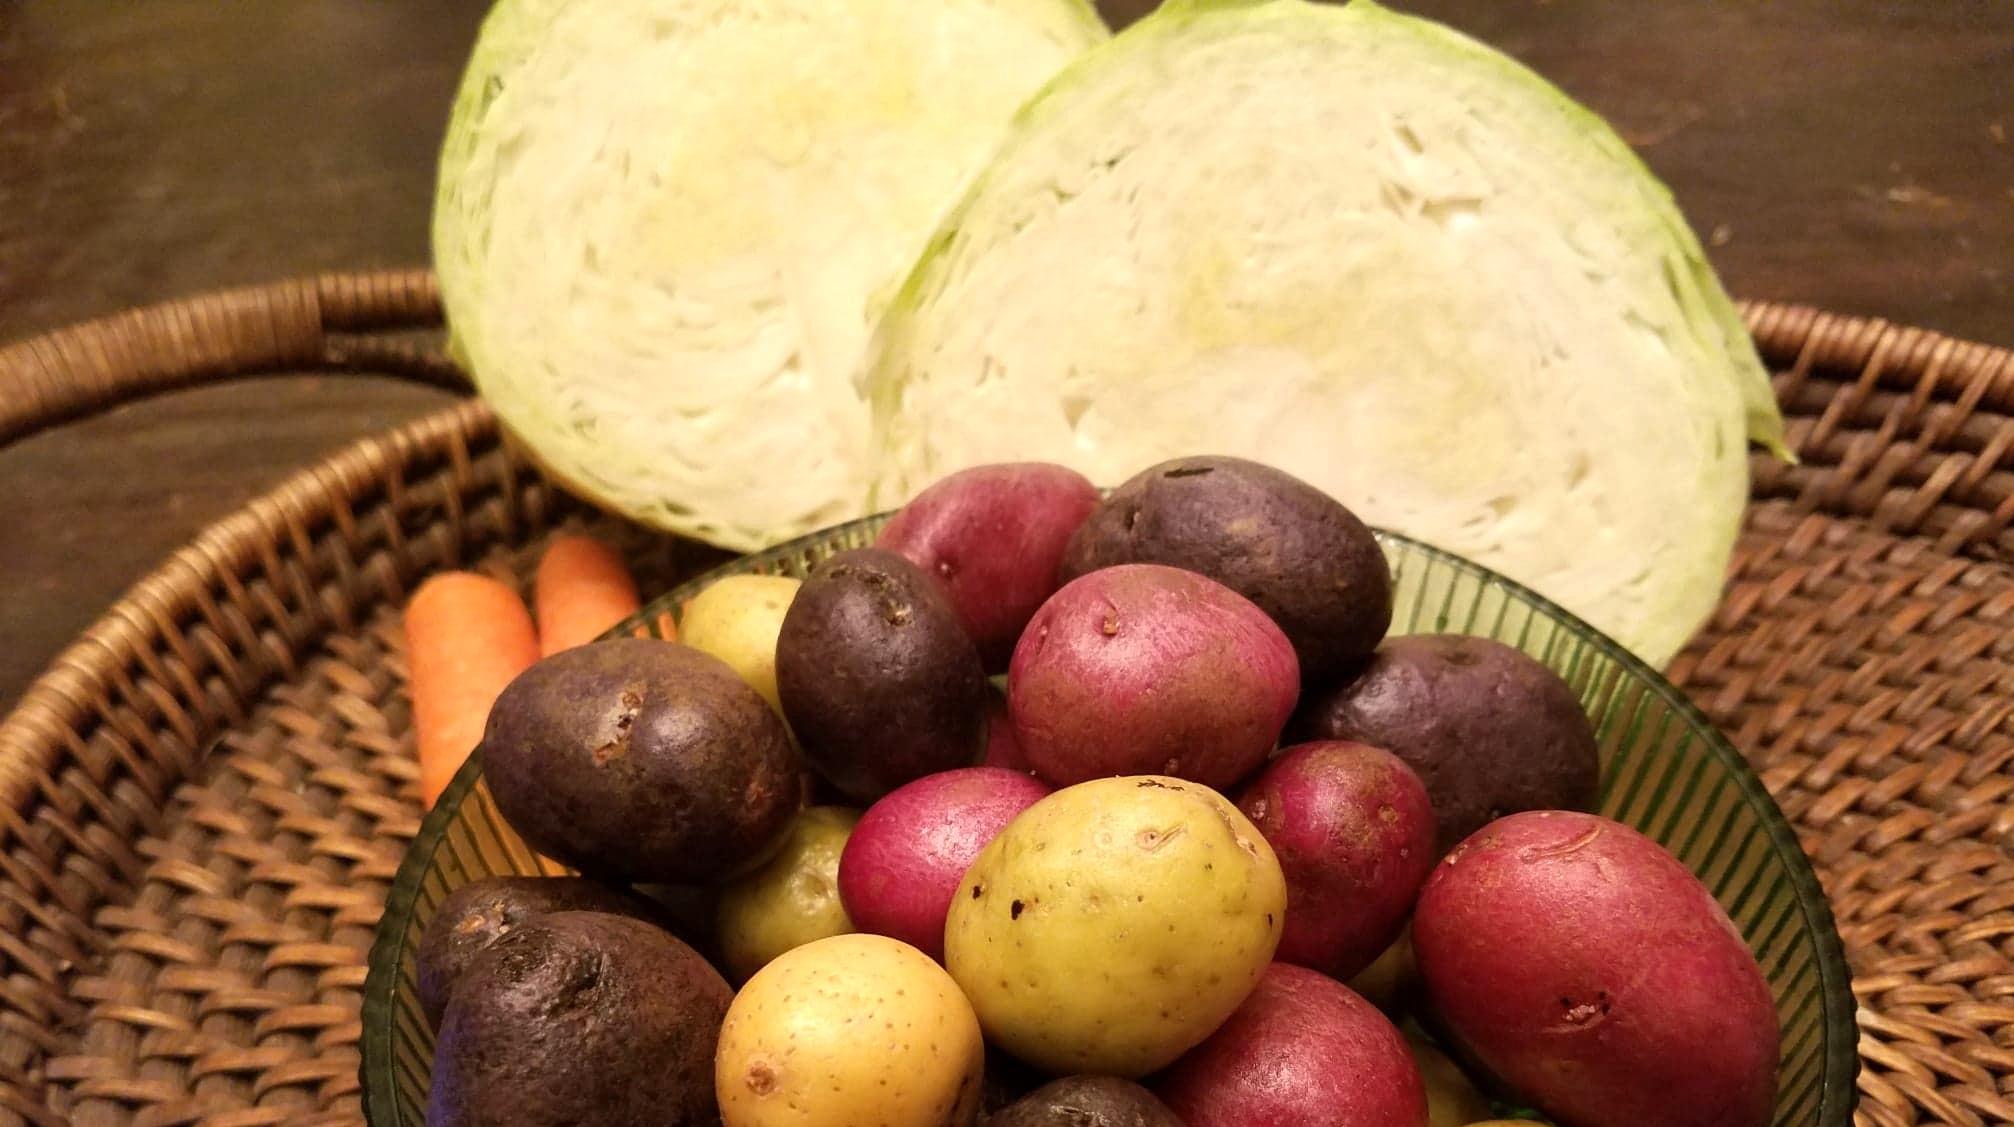 potatoes, cabbage